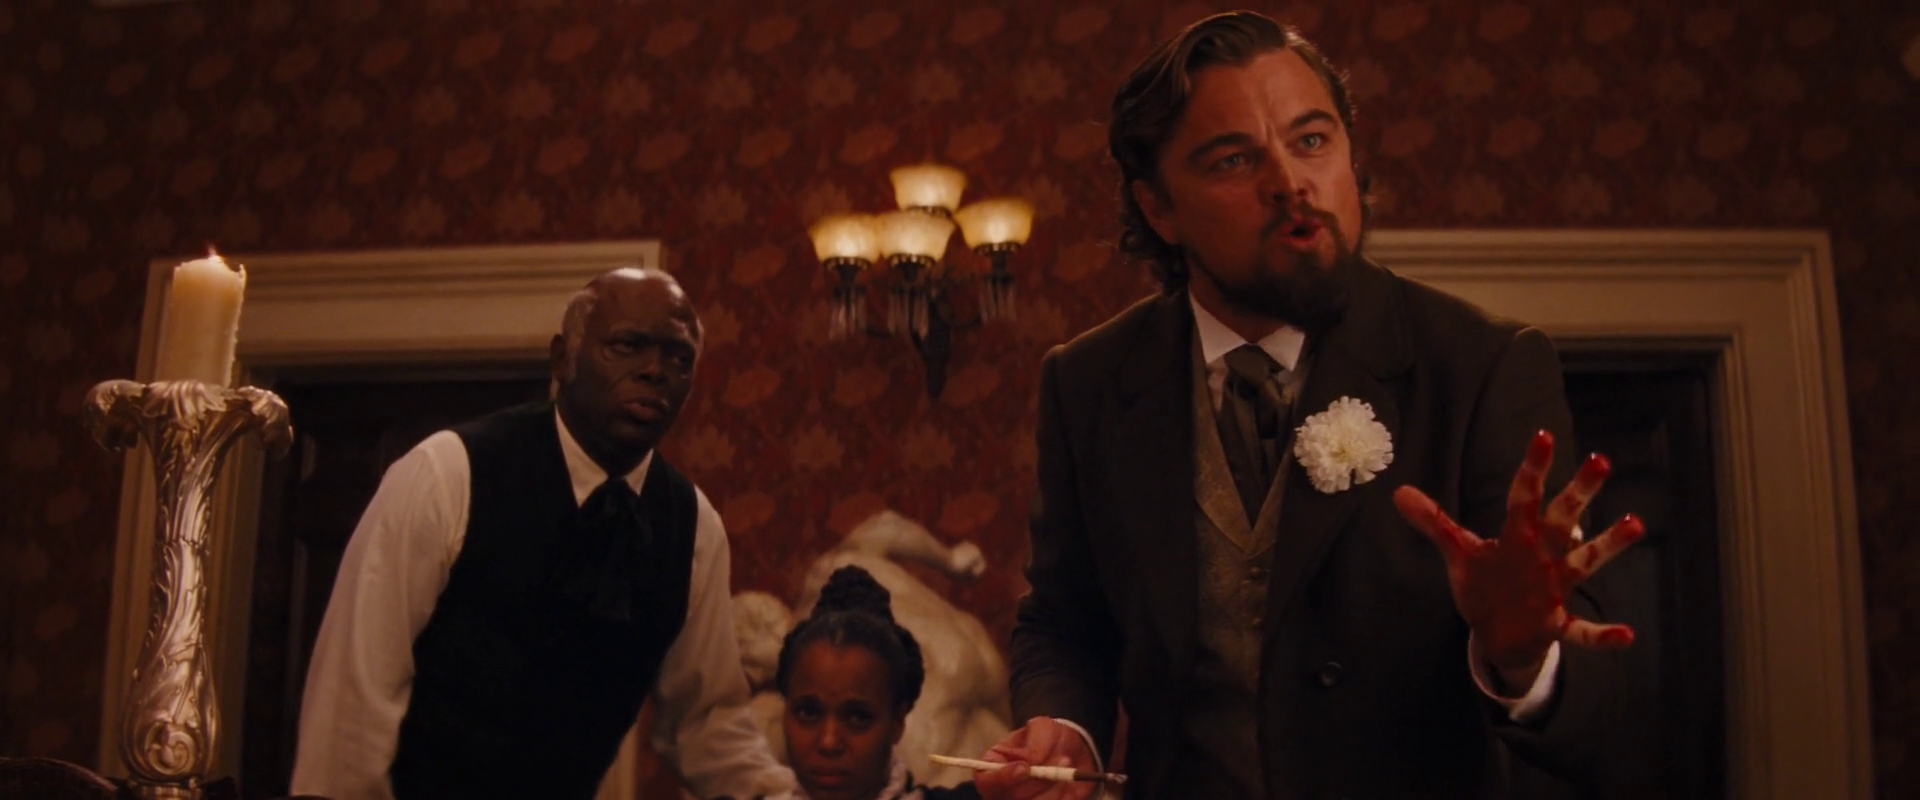 Django Unchained (Quentin Tarantino, 2012).